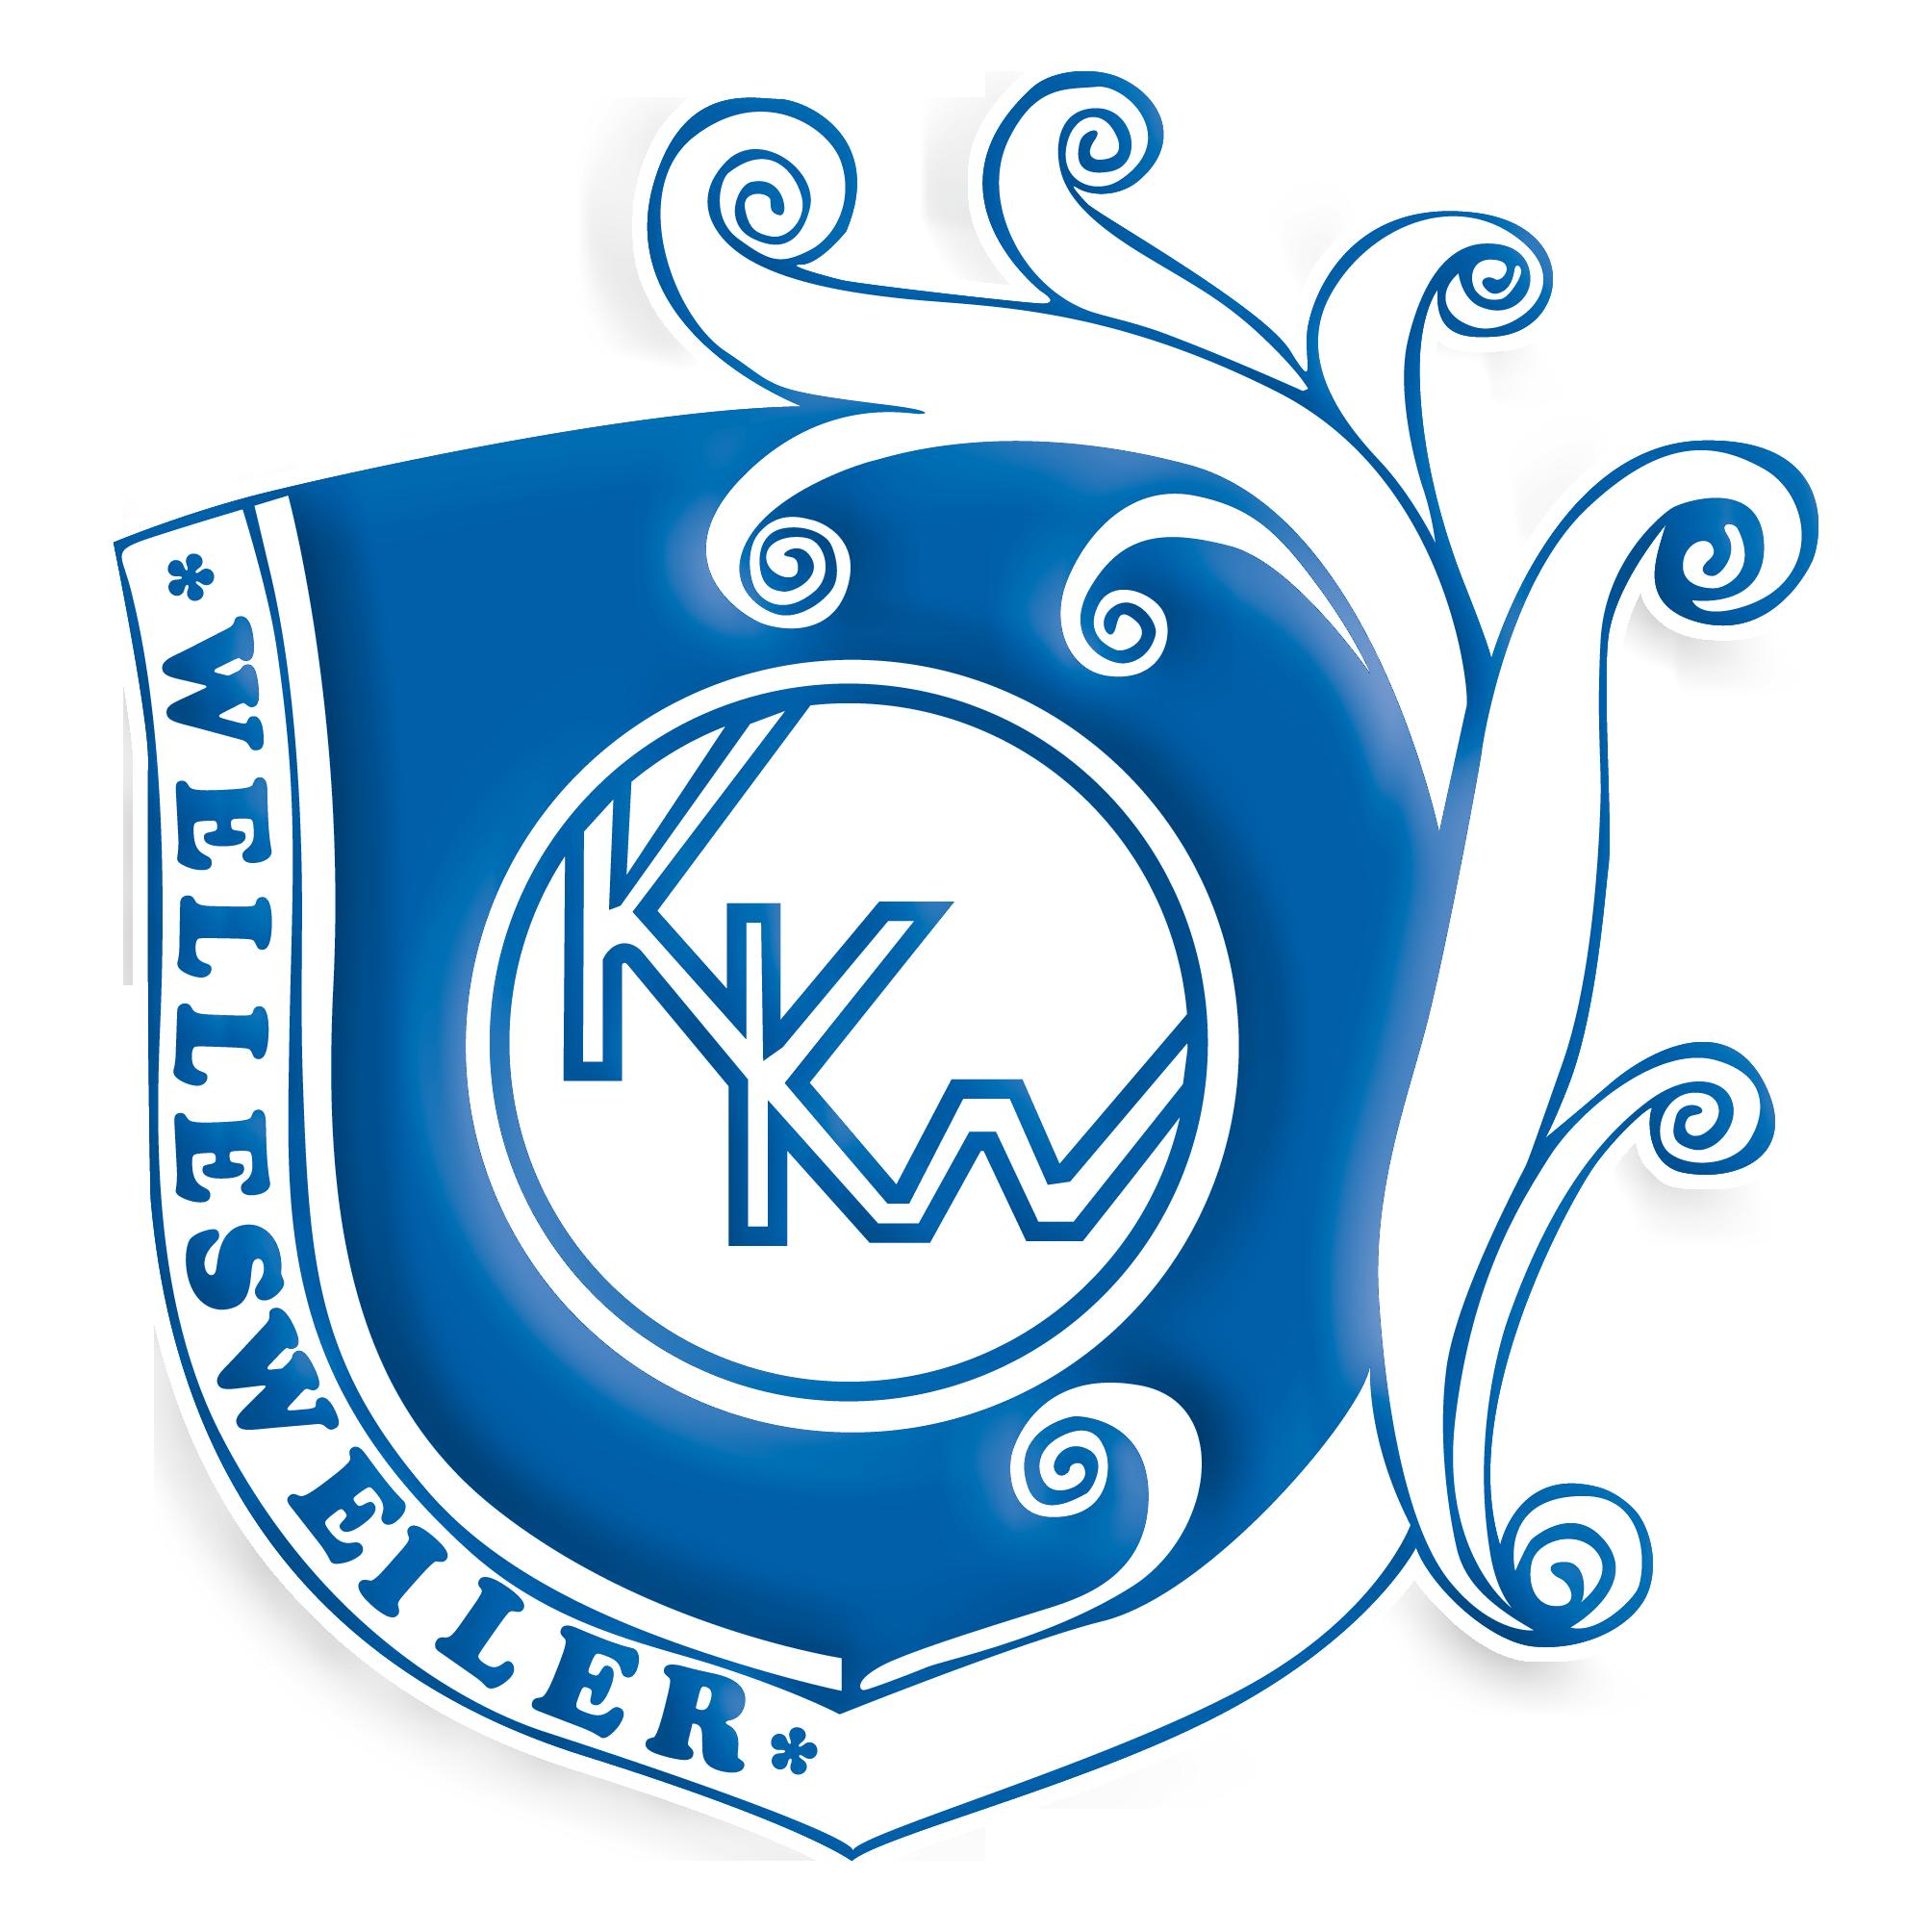 Karnevals- und Kulturvereins Wellesweiler e.V. - Test